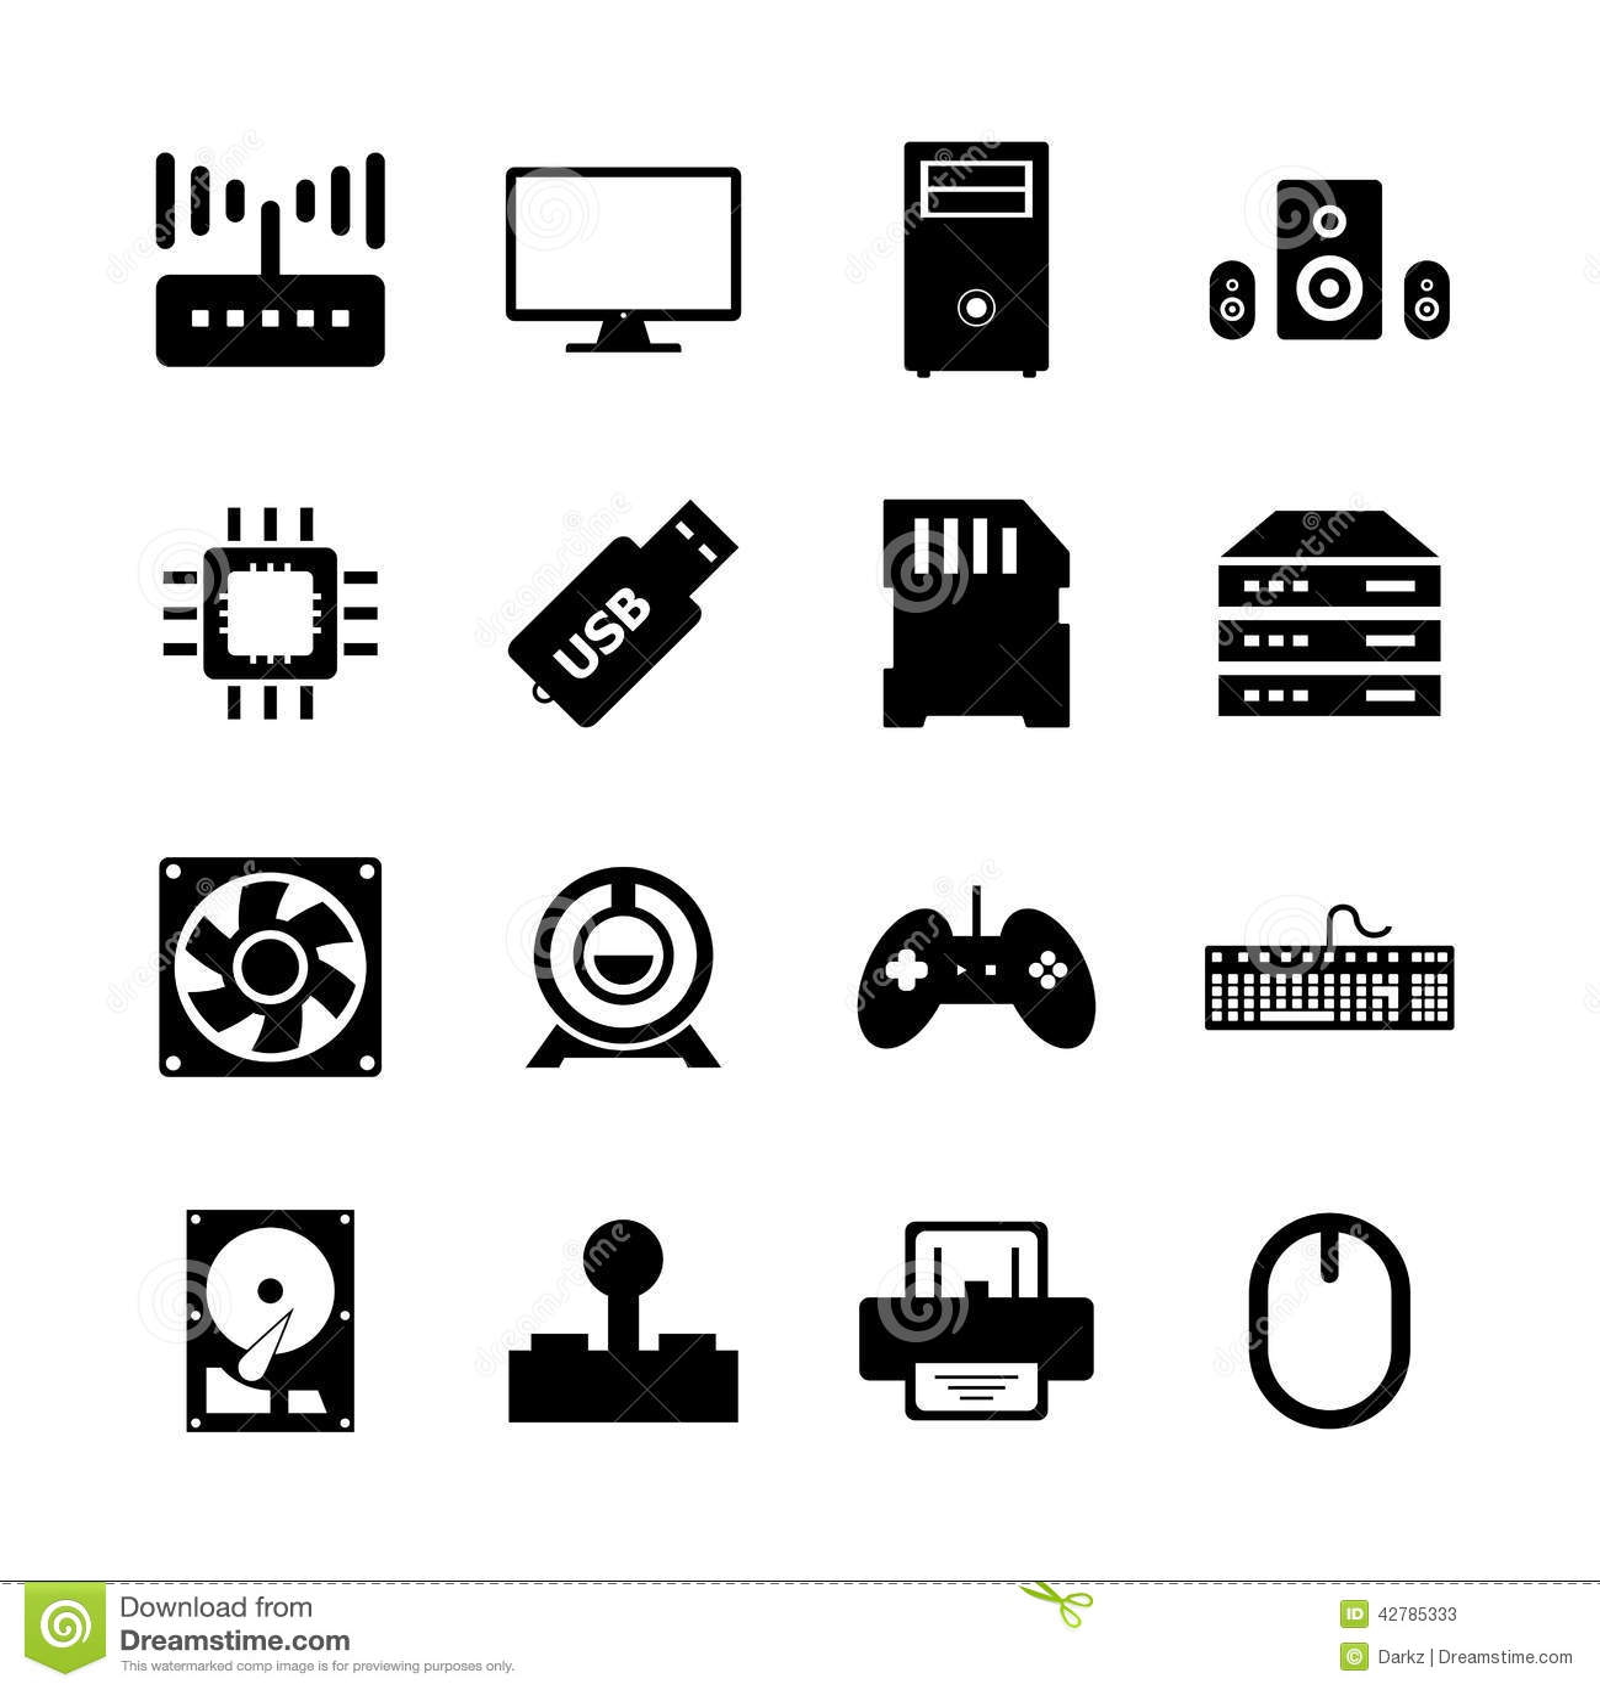 computer hardware icon stock illustration  illustration of